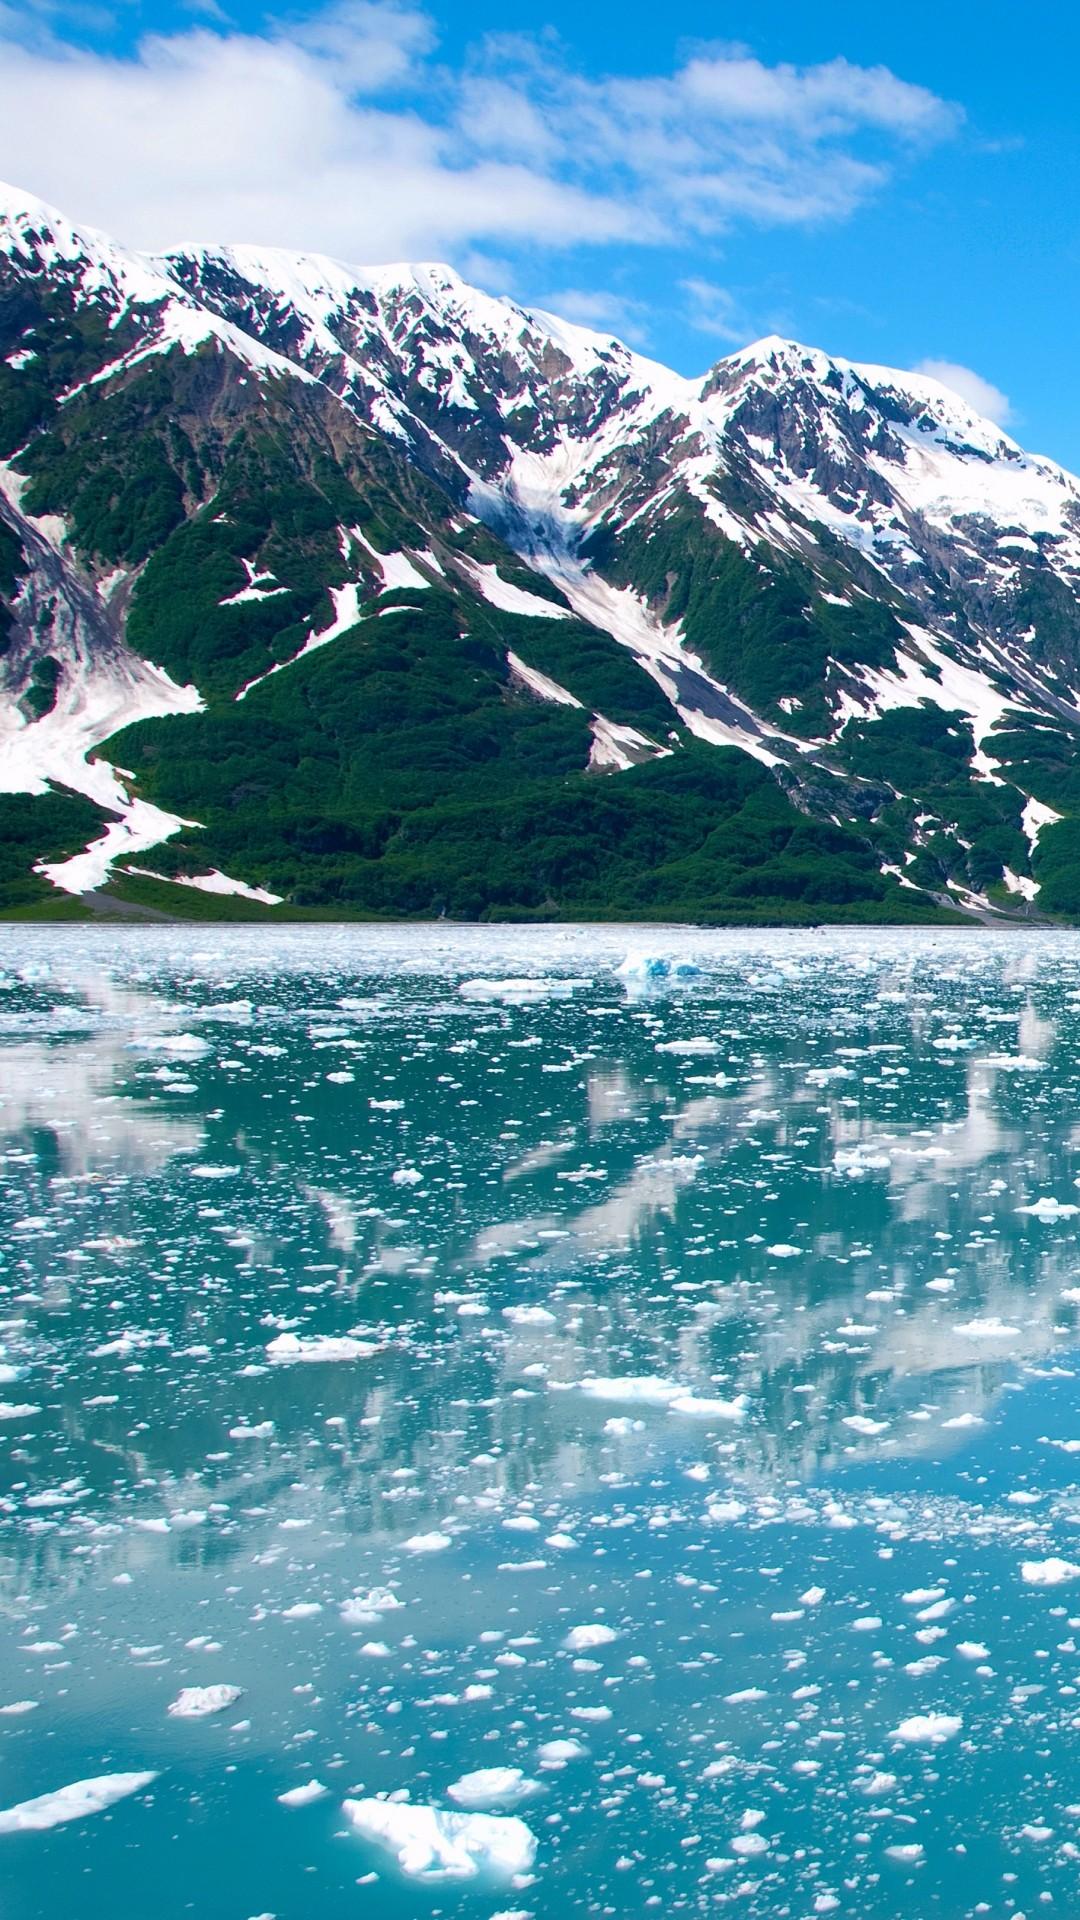 Preview wallpaper alaska, glacier, mountains, sky 1080×1920